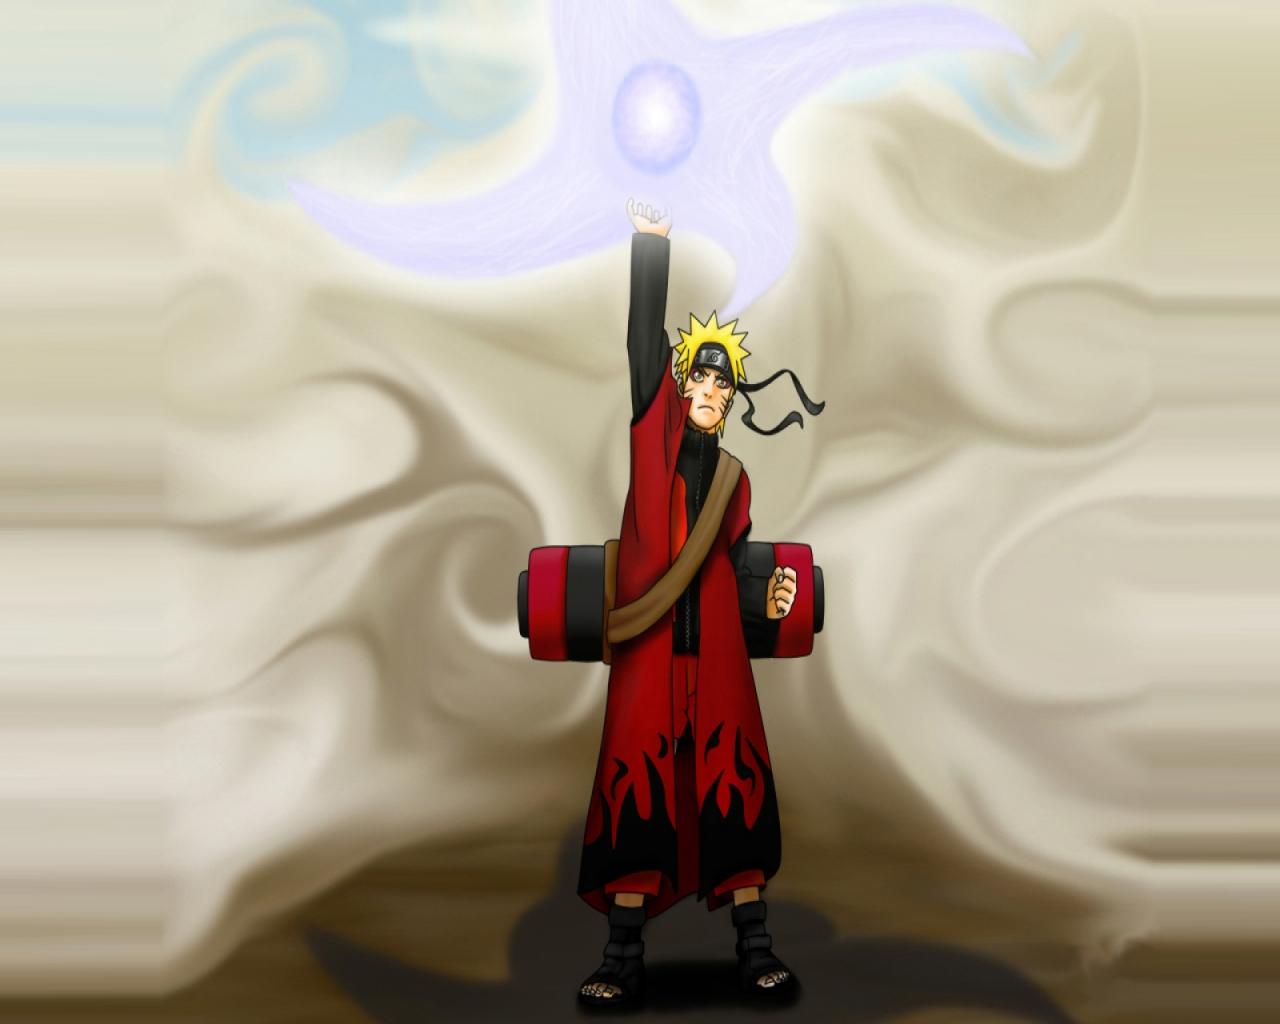 49 ] Naruto Sage Mode Wallpapers On WallpaperSafari